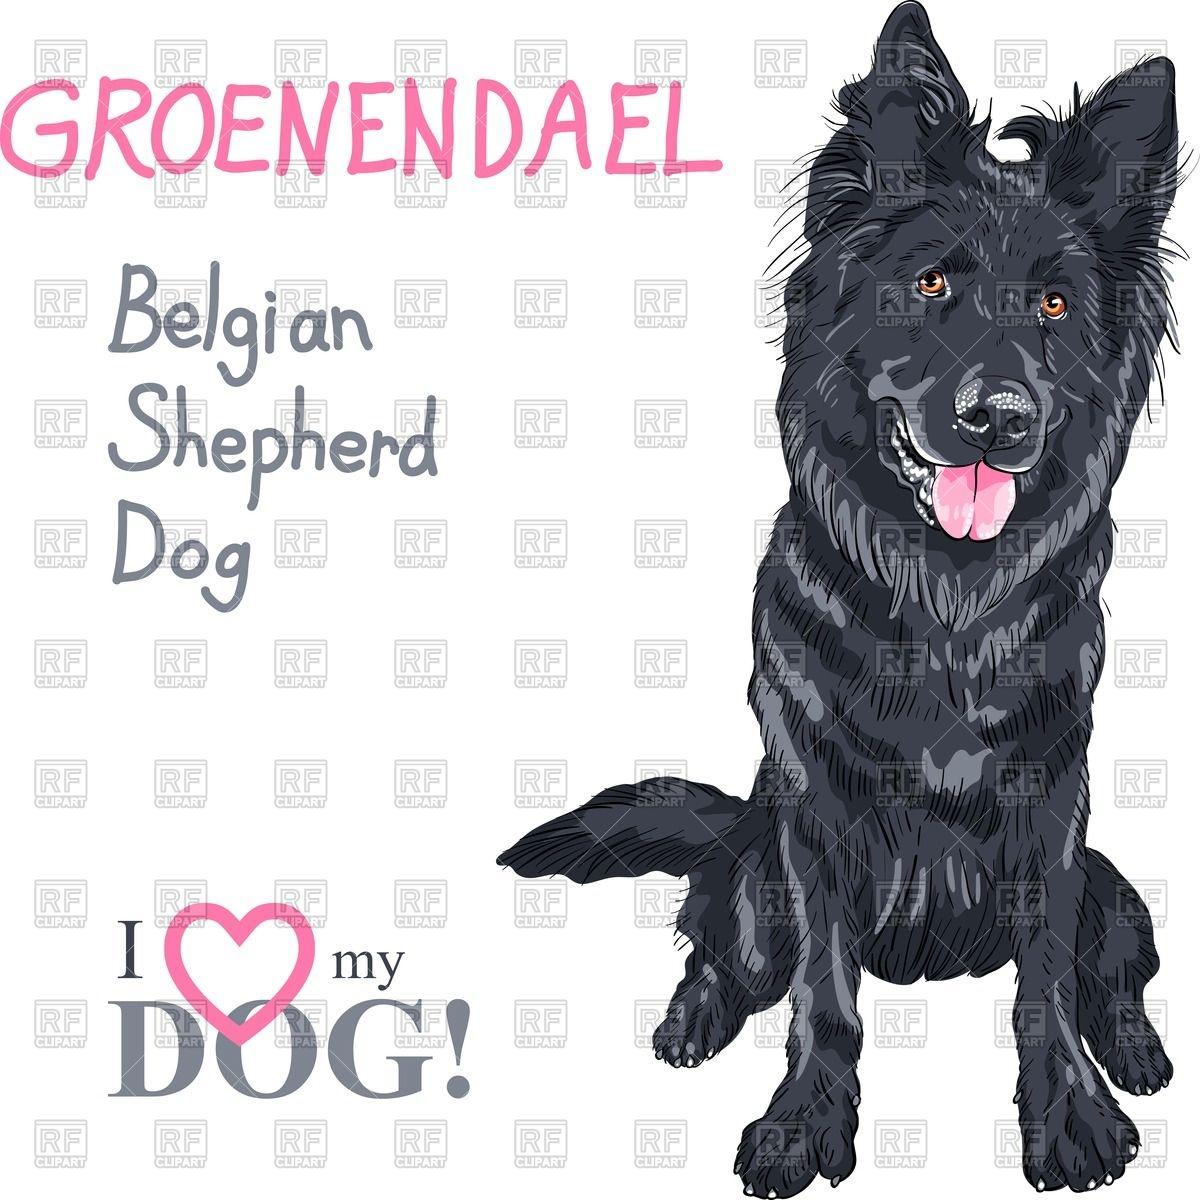 Portrait of dog of Belgian Shepherd Dog breed.